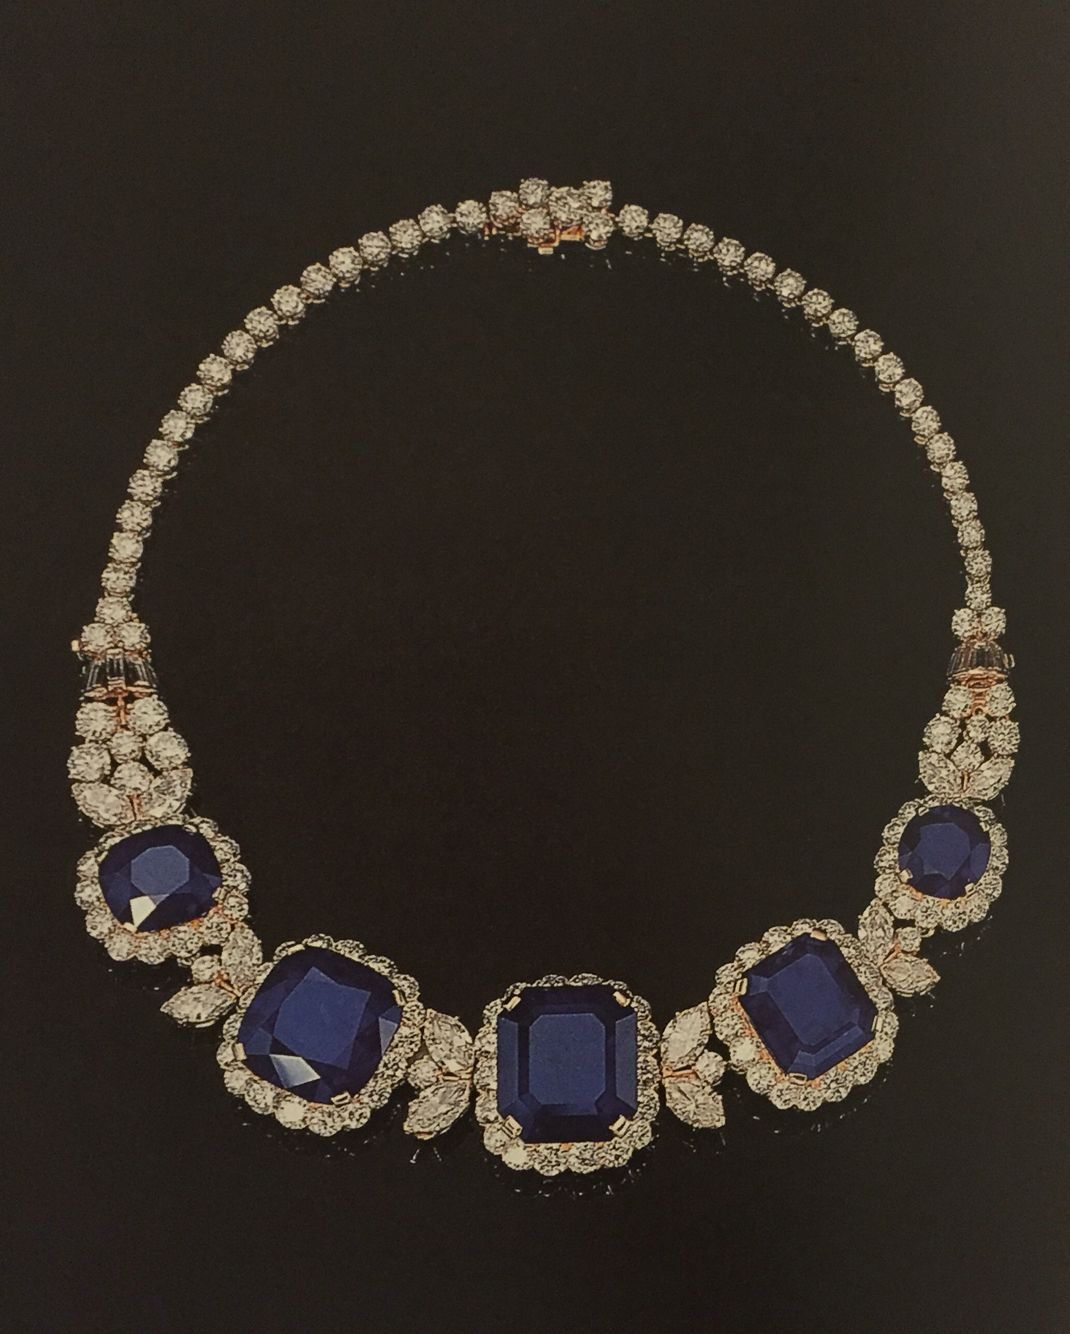 Luz Mila Patiño, Countess du Boisrouvray jewels